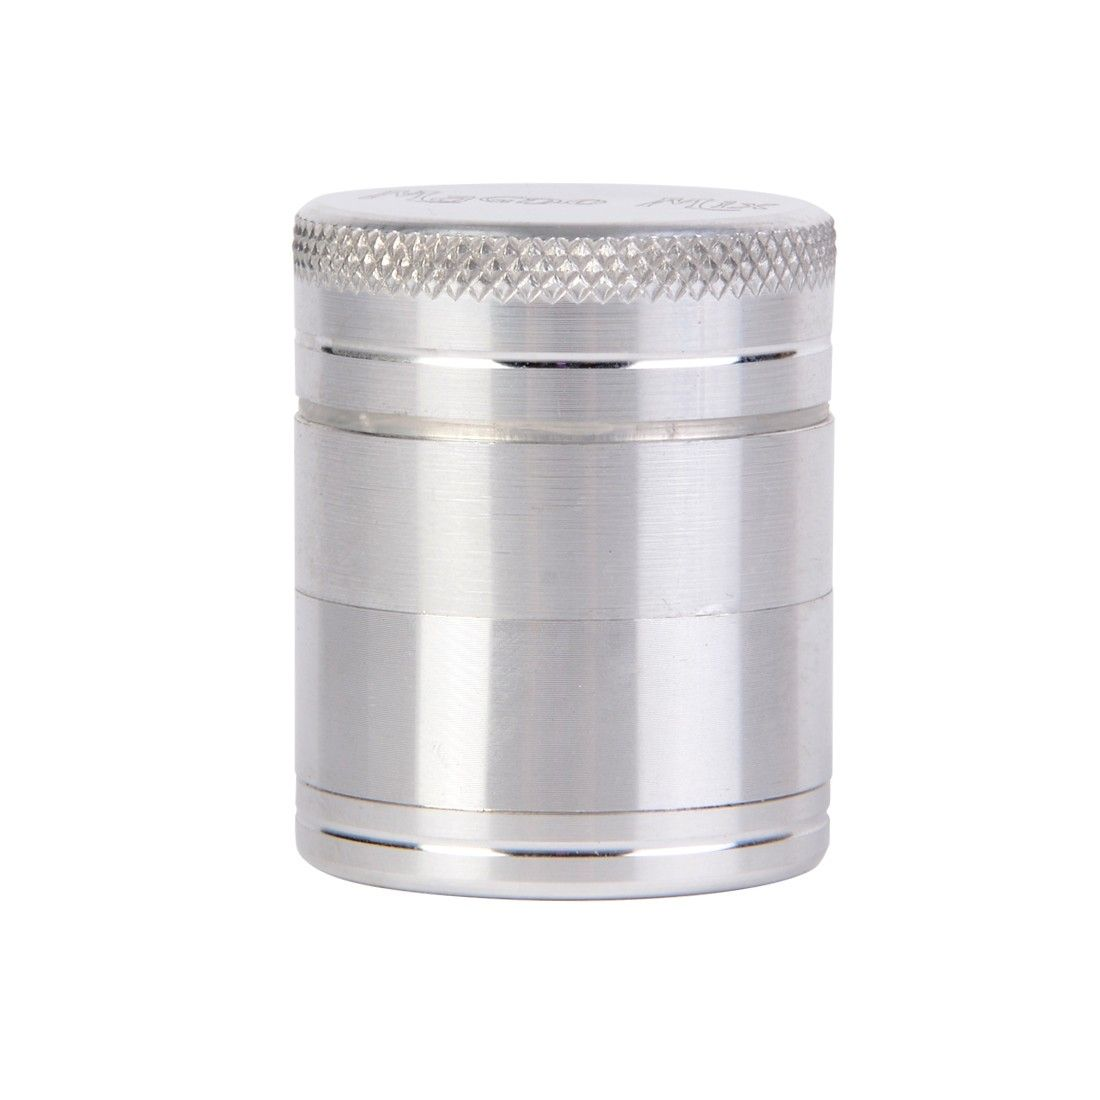 grinder aluminium magnomix 30mm broyeur herbes 4 parties petit format. Black Bedroom Furniture Sets. Home Design Ideas